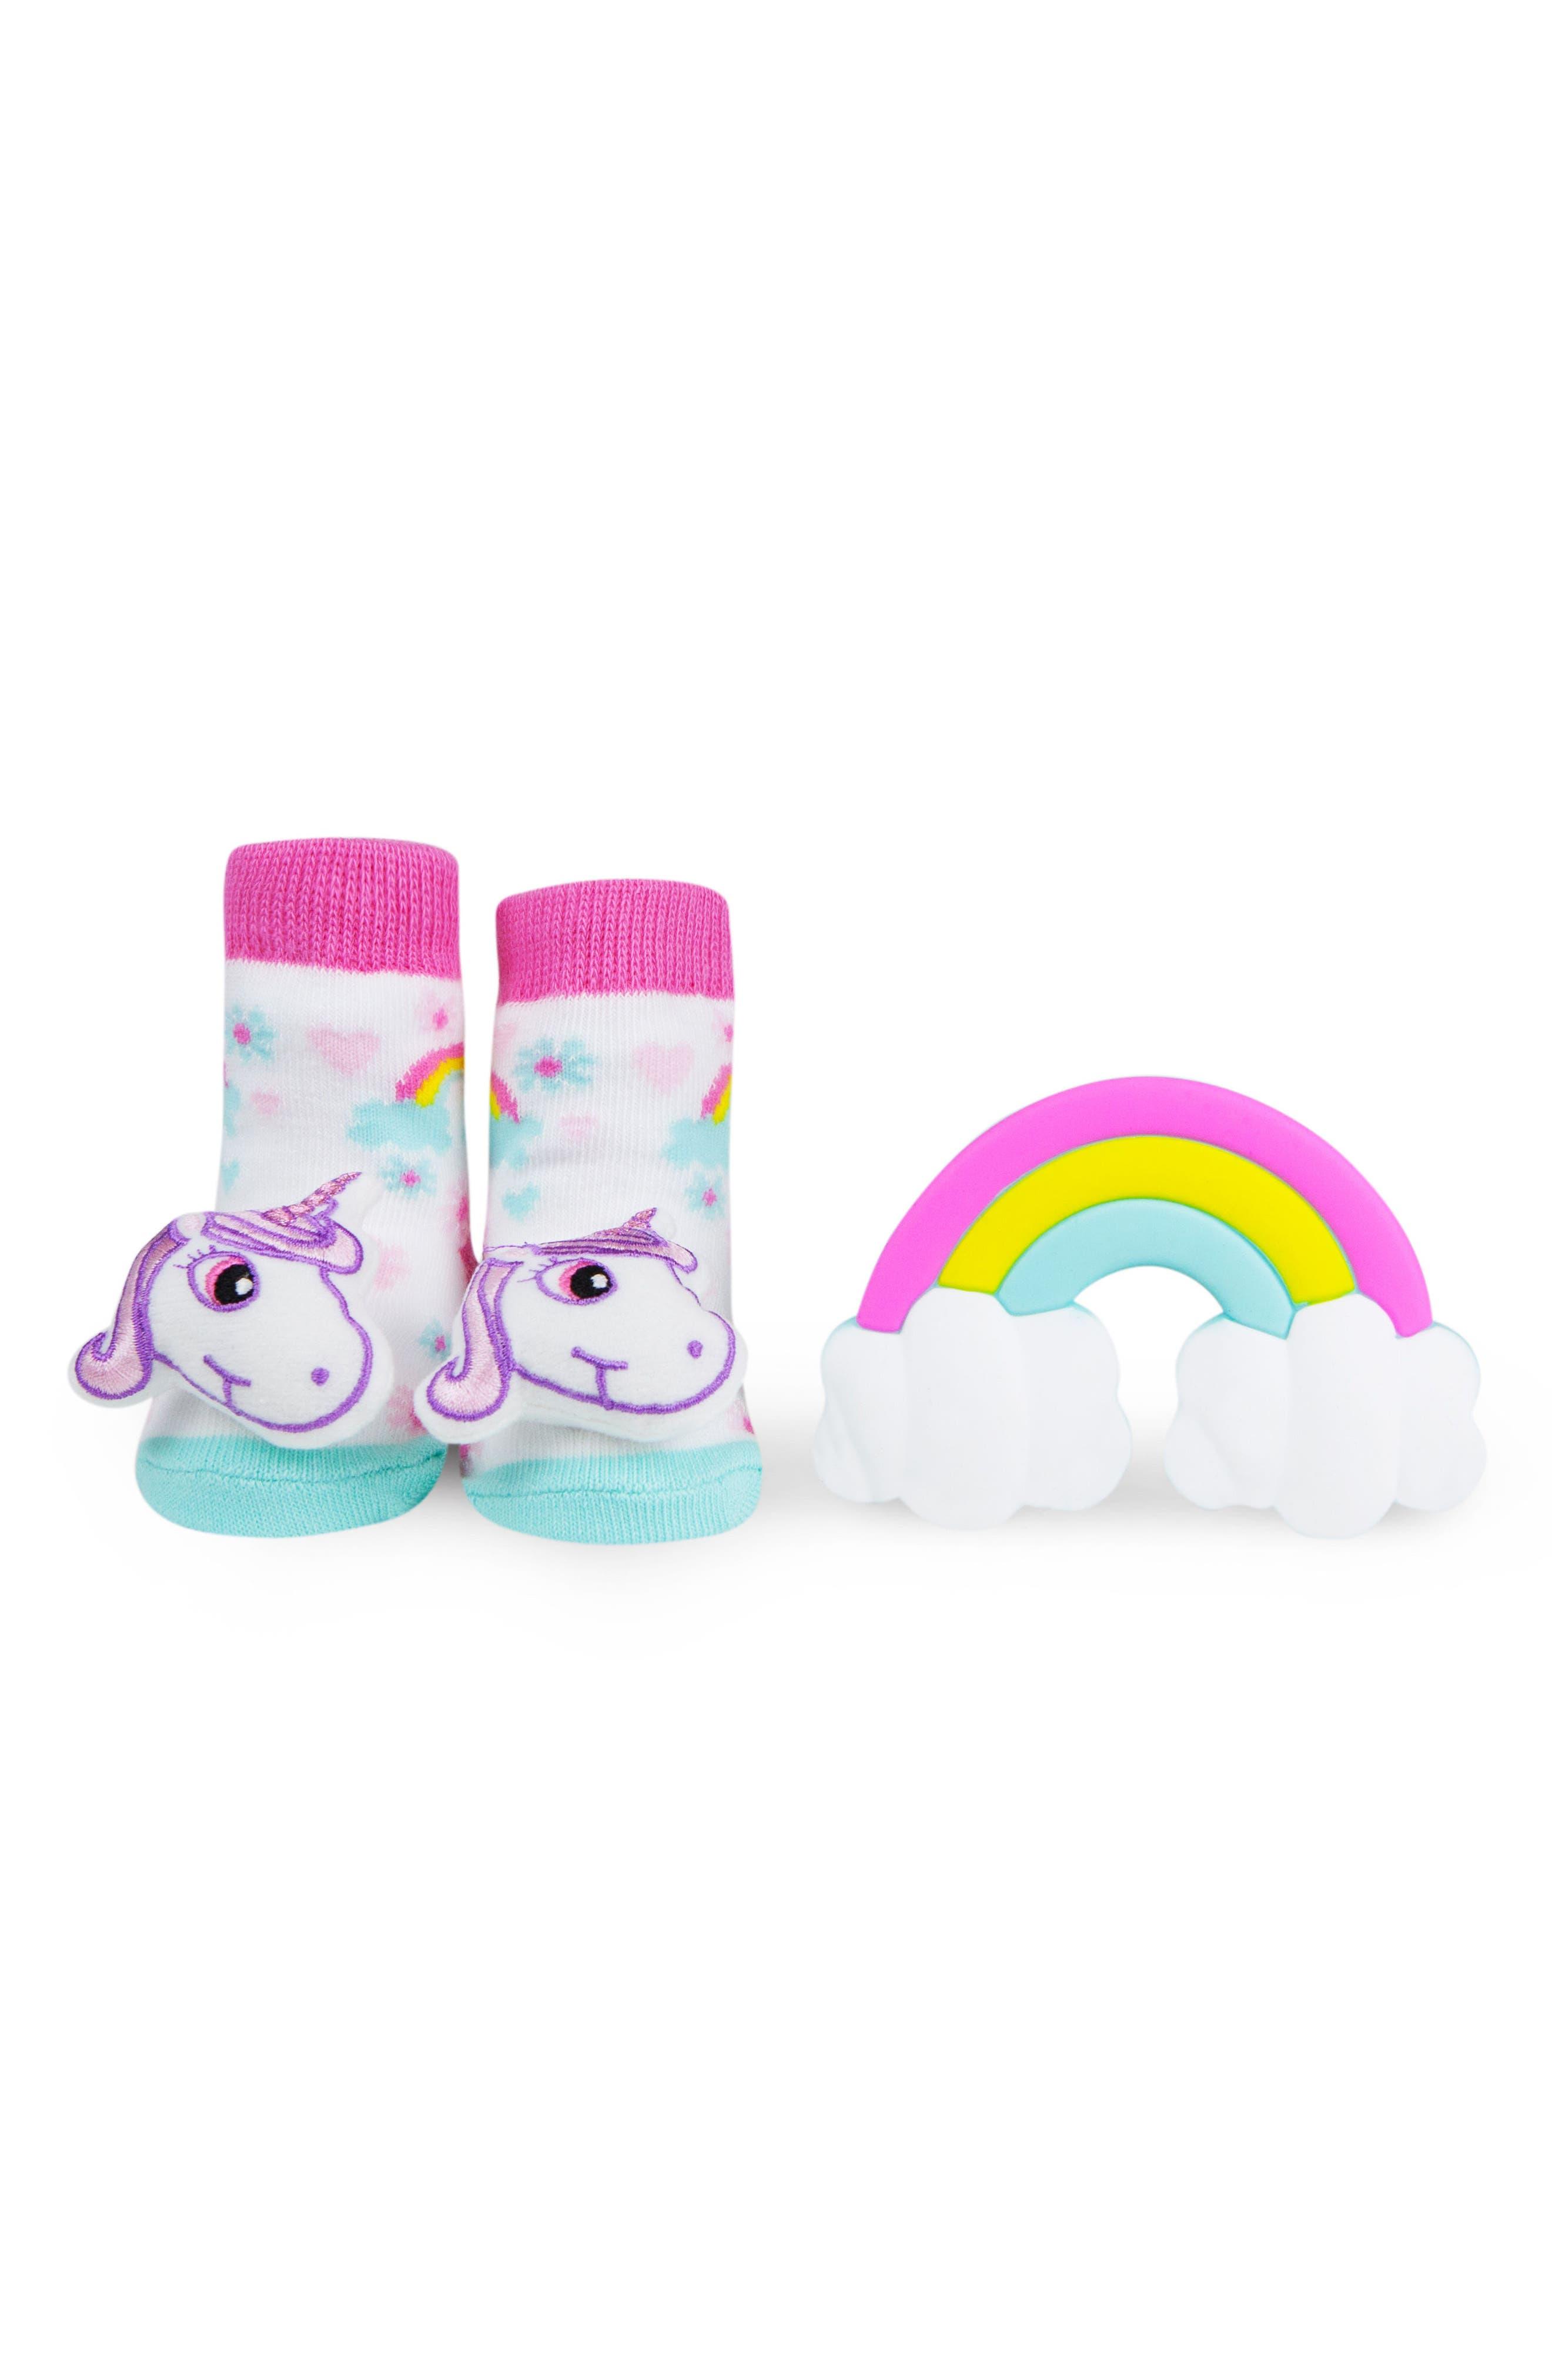 & Friends Unicorn Rattle Socks & Teether Gift Set,                             Main thumbnail 1, color,                             100